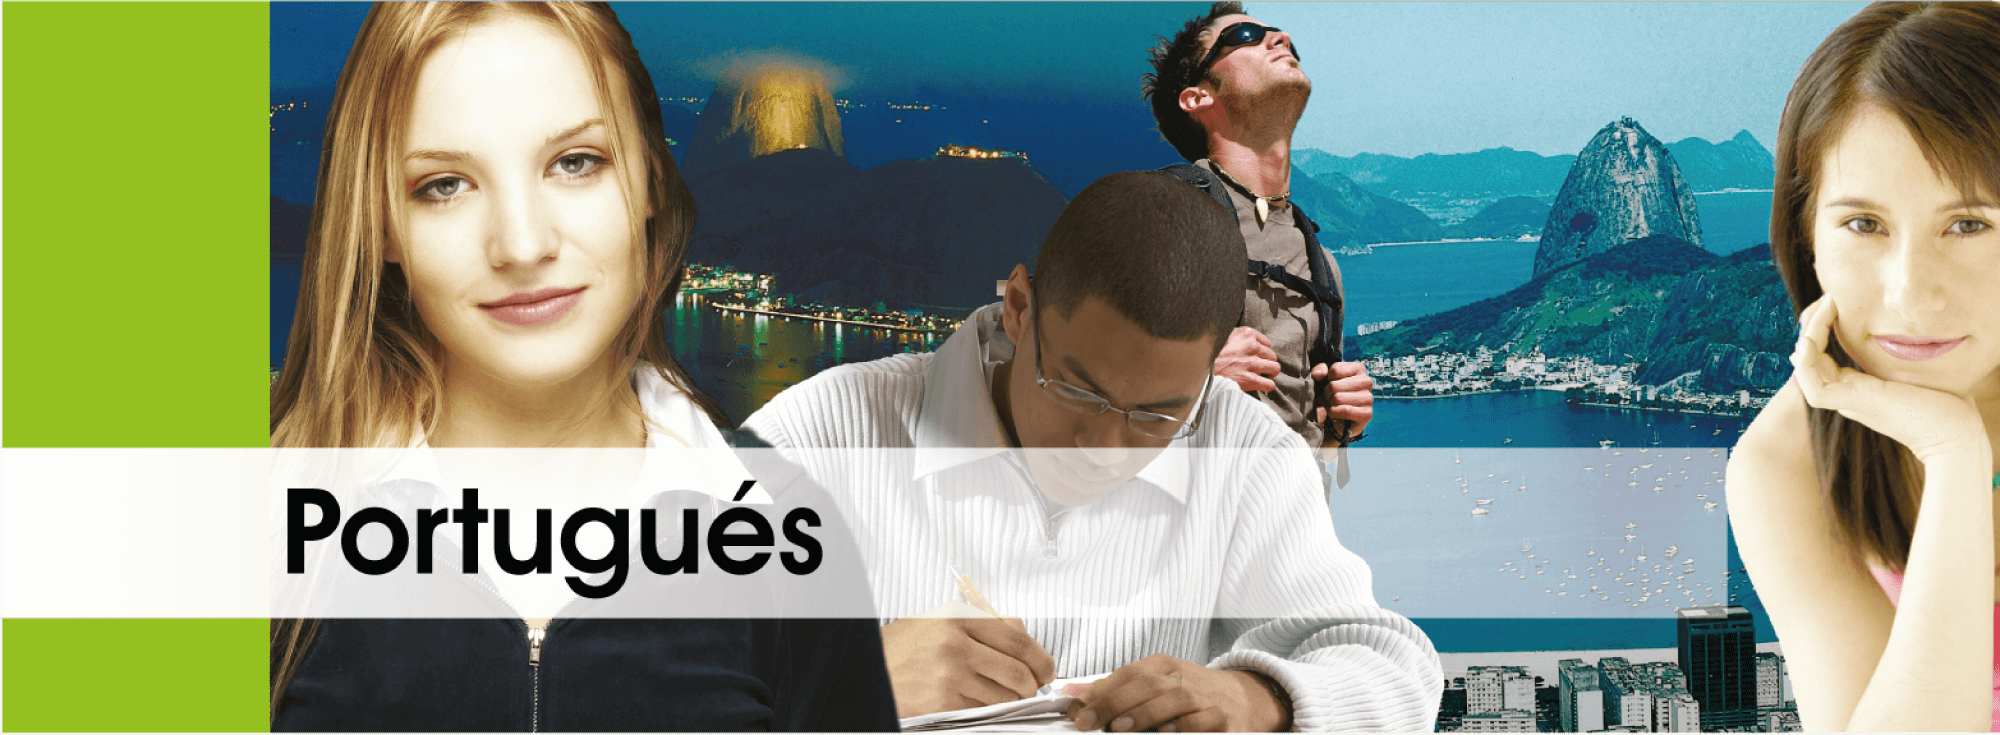 Portugues Curso Idiomas Portugues Htl Idiomas